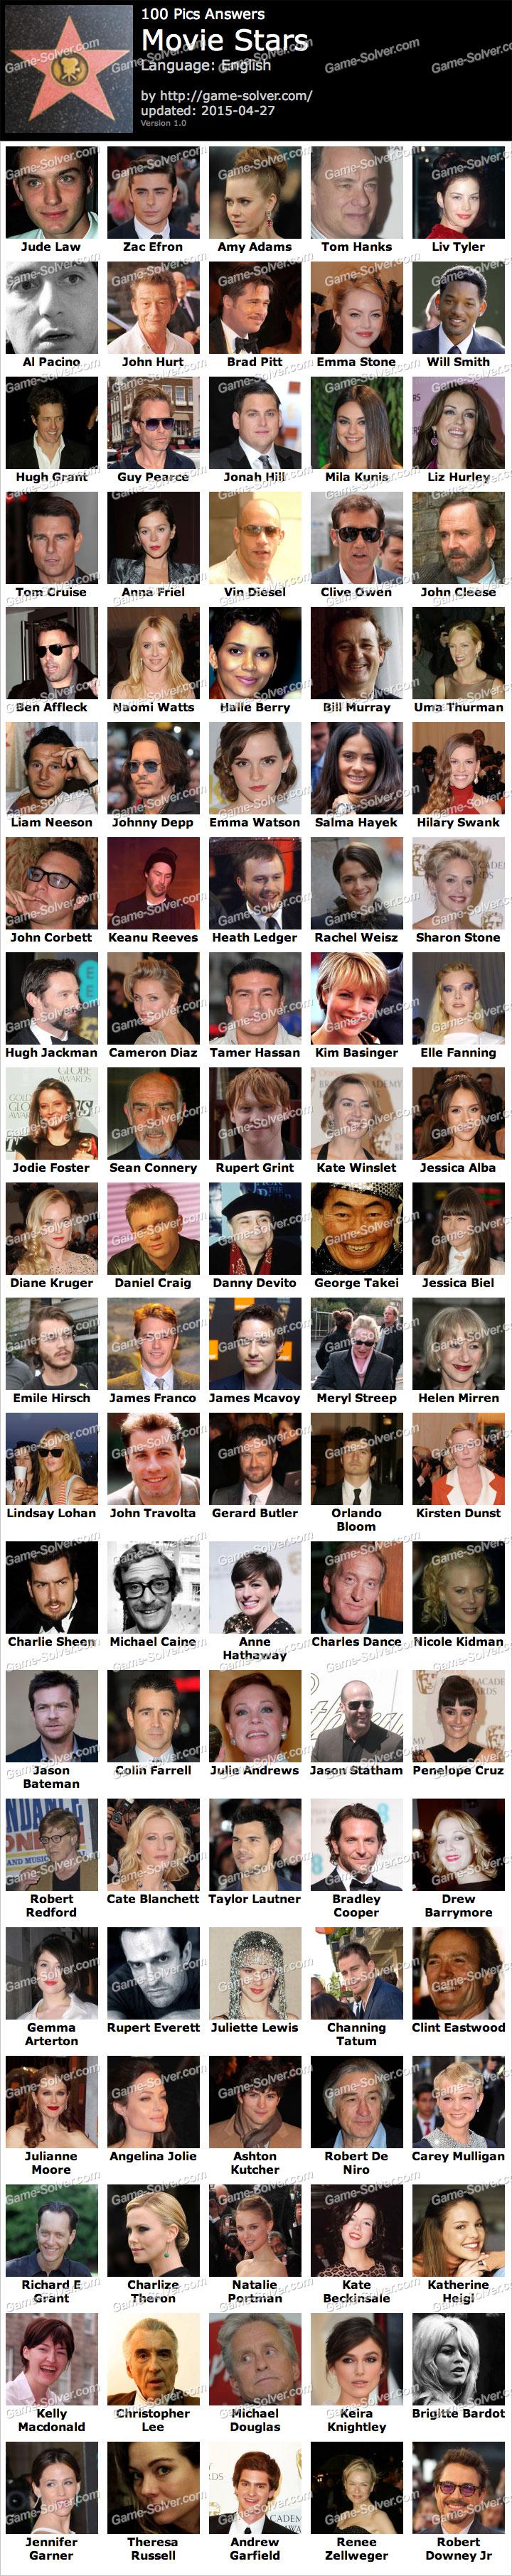 Stars answers movie 100 pics